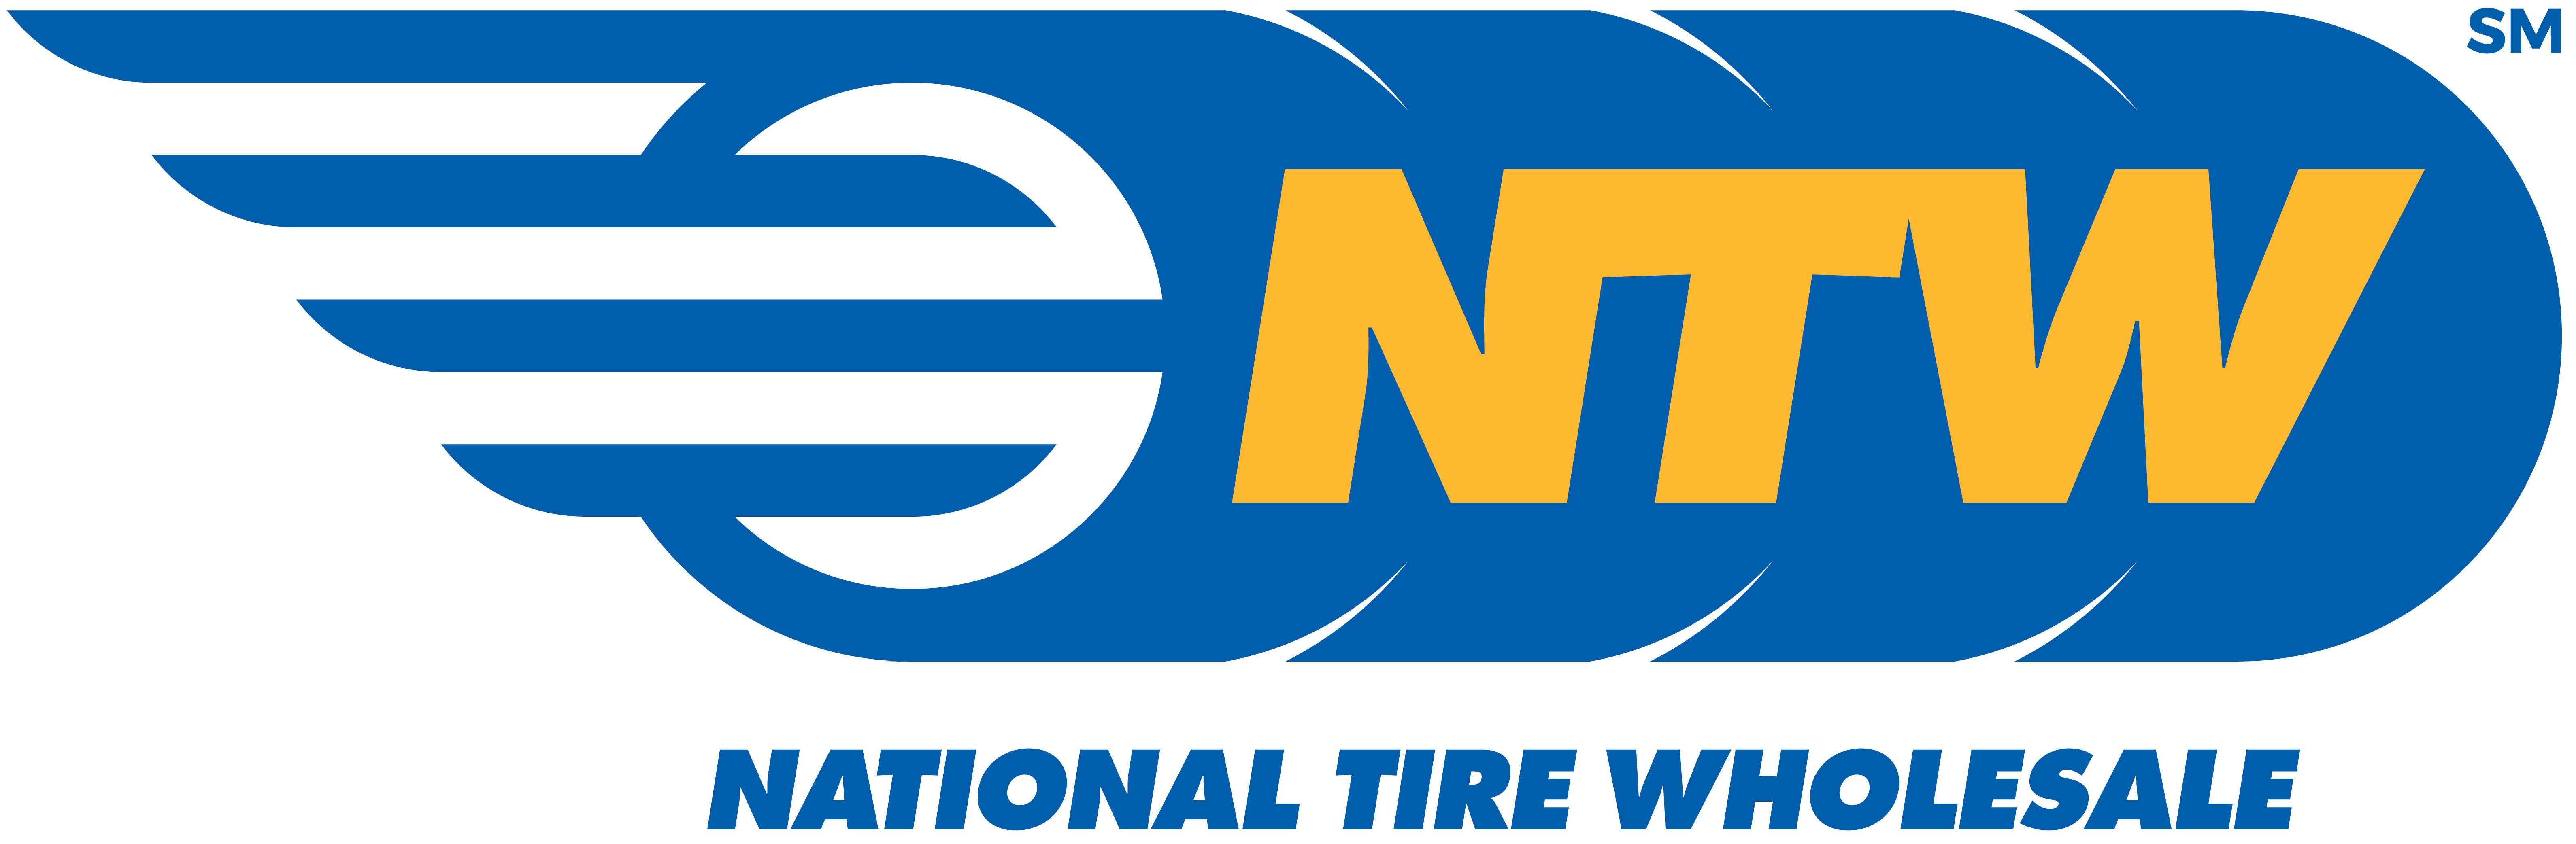 Tire Wholesale Warehouse >> Ntwonline